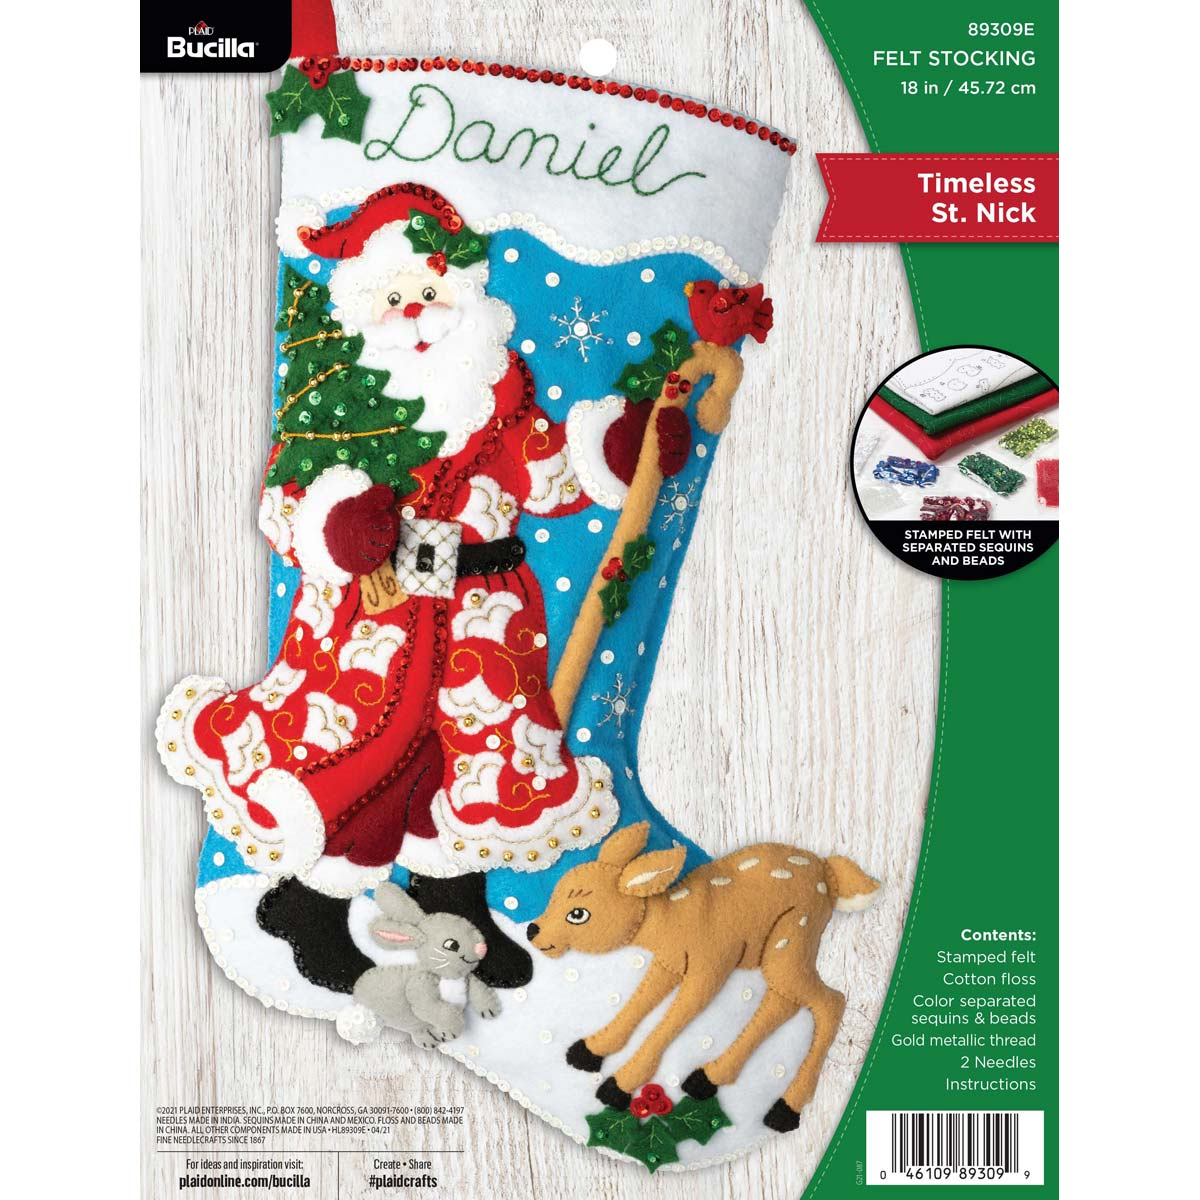 Bucilla ® Seasonal - Felt - Stocking Kits - Timeless St. Nick - 89309E